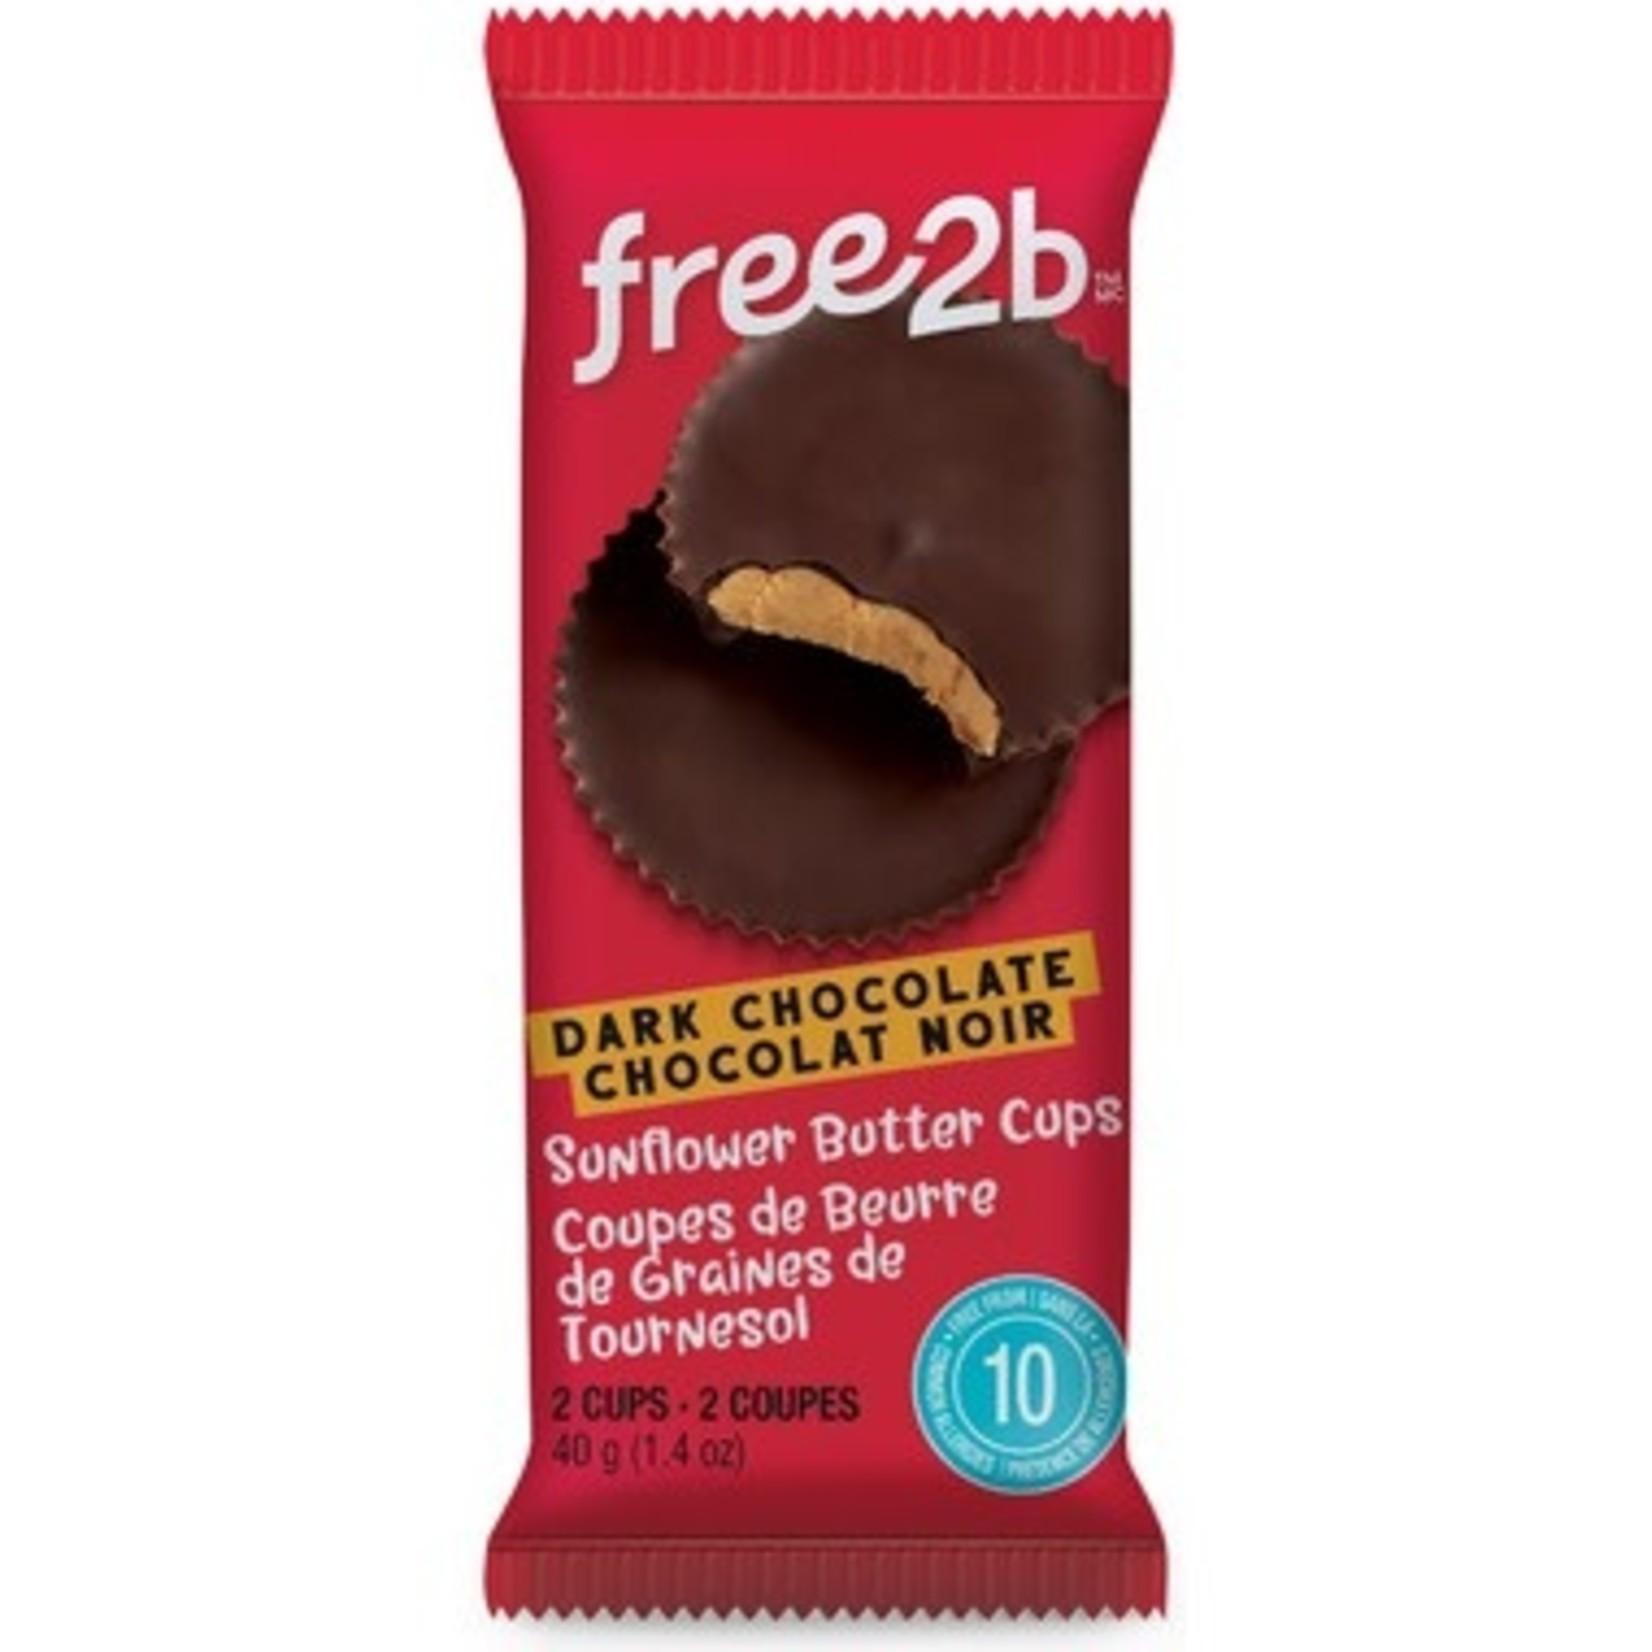 Free2B Free2B Dark Chocolate Sunflower Butter Cups